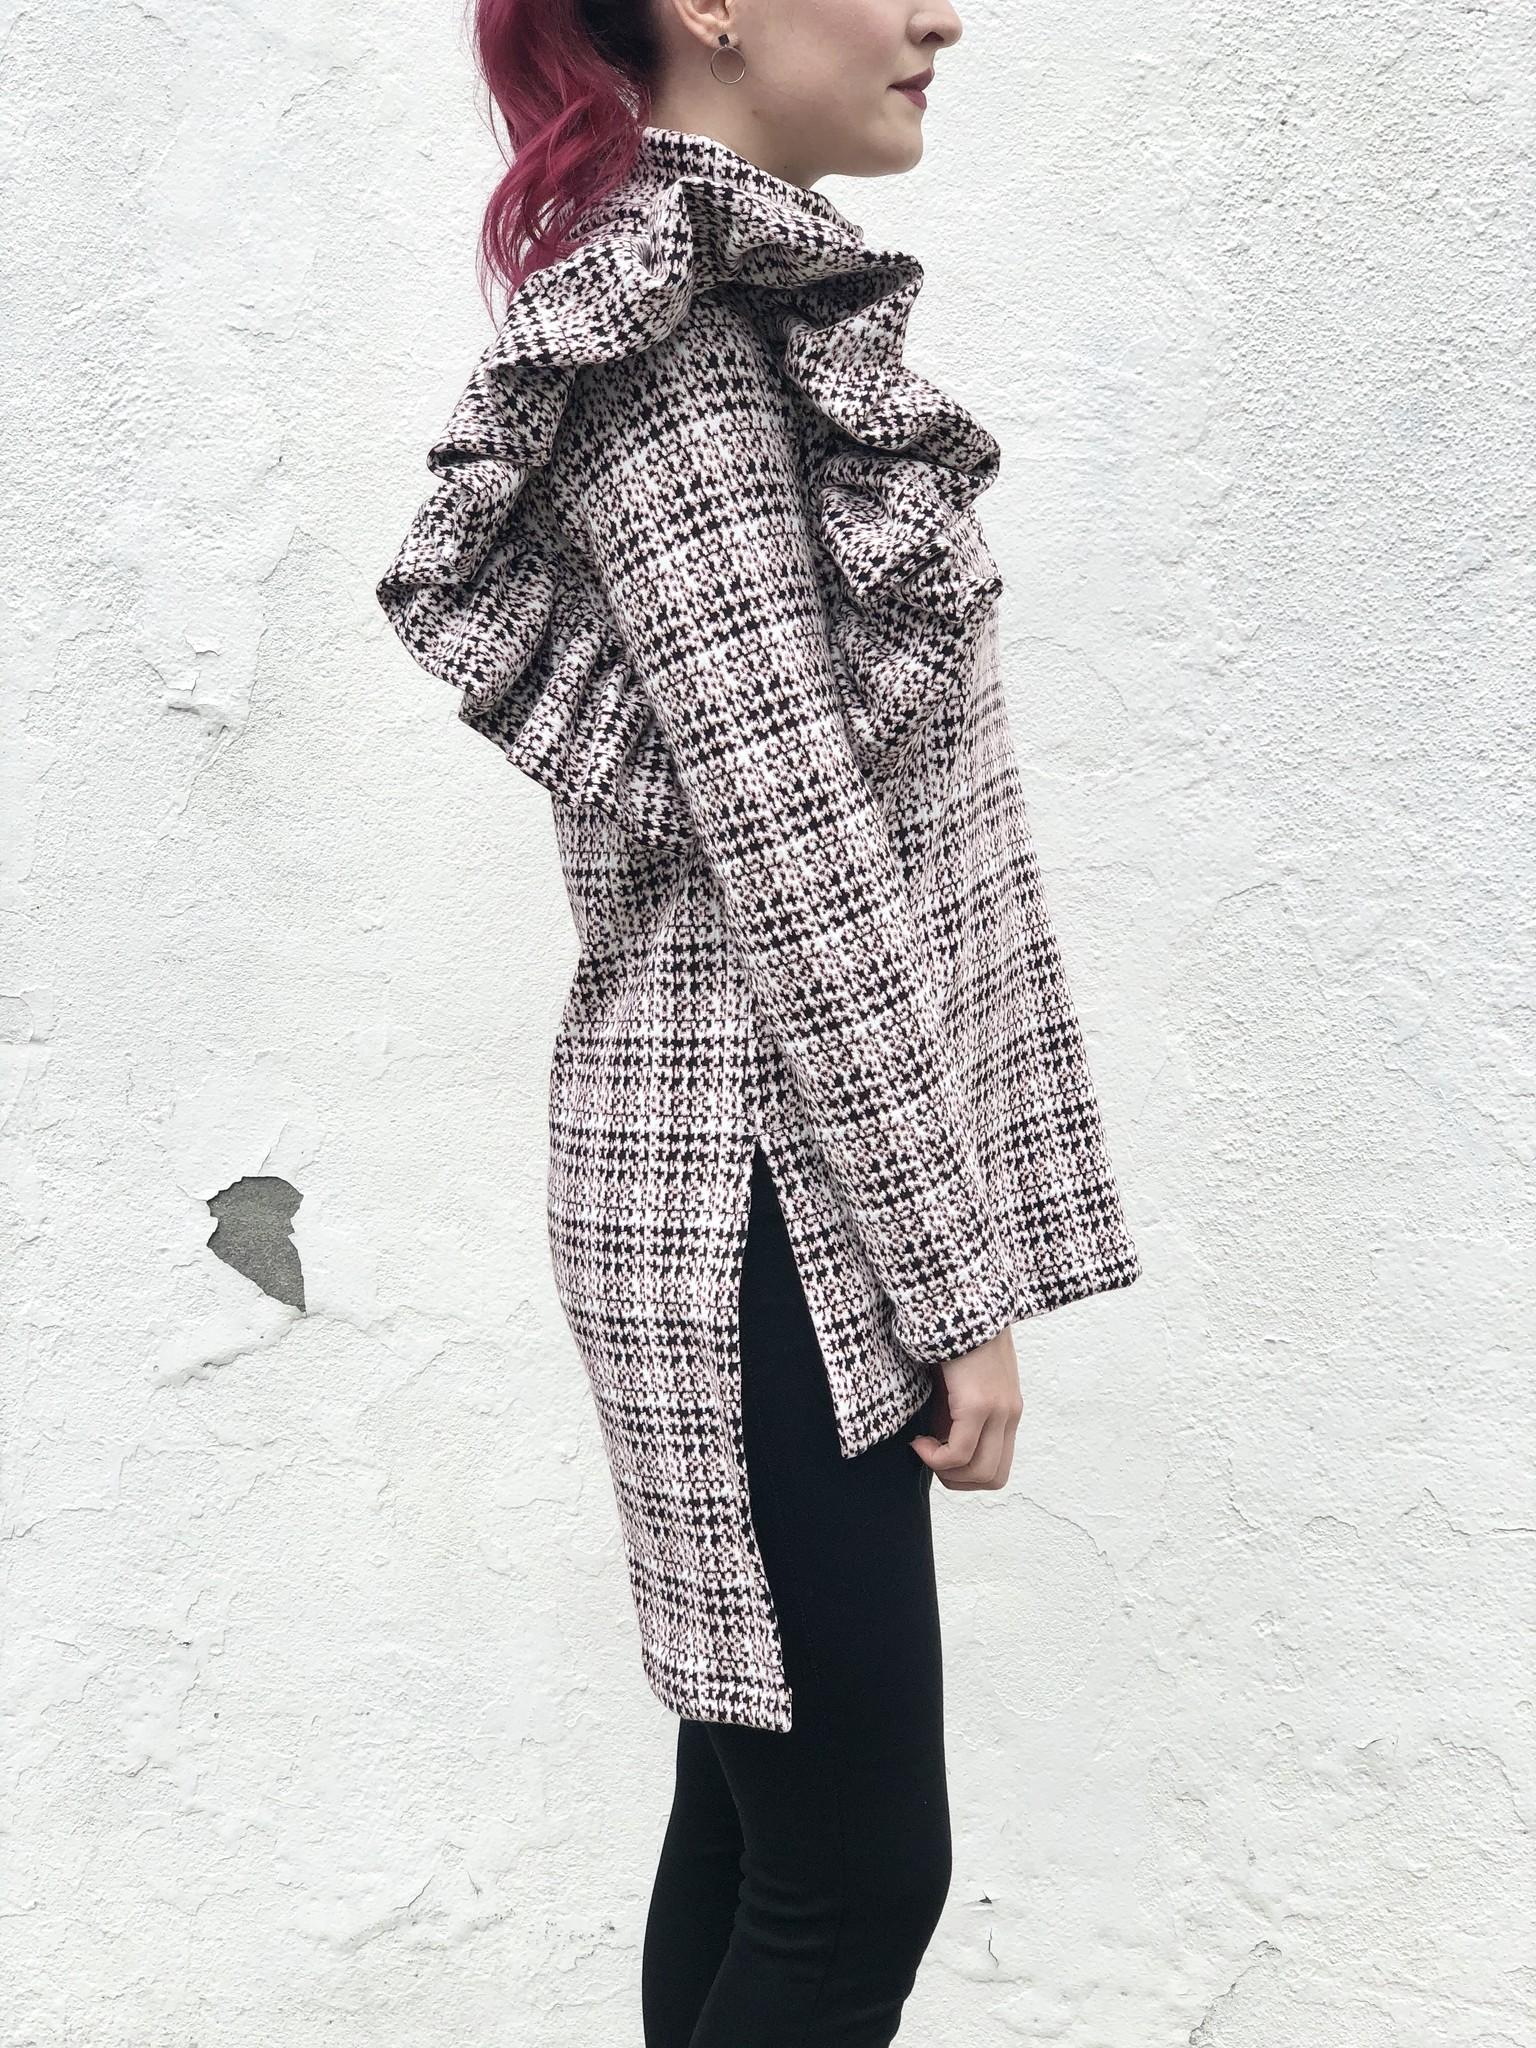 Sooley Designs Valentine Top